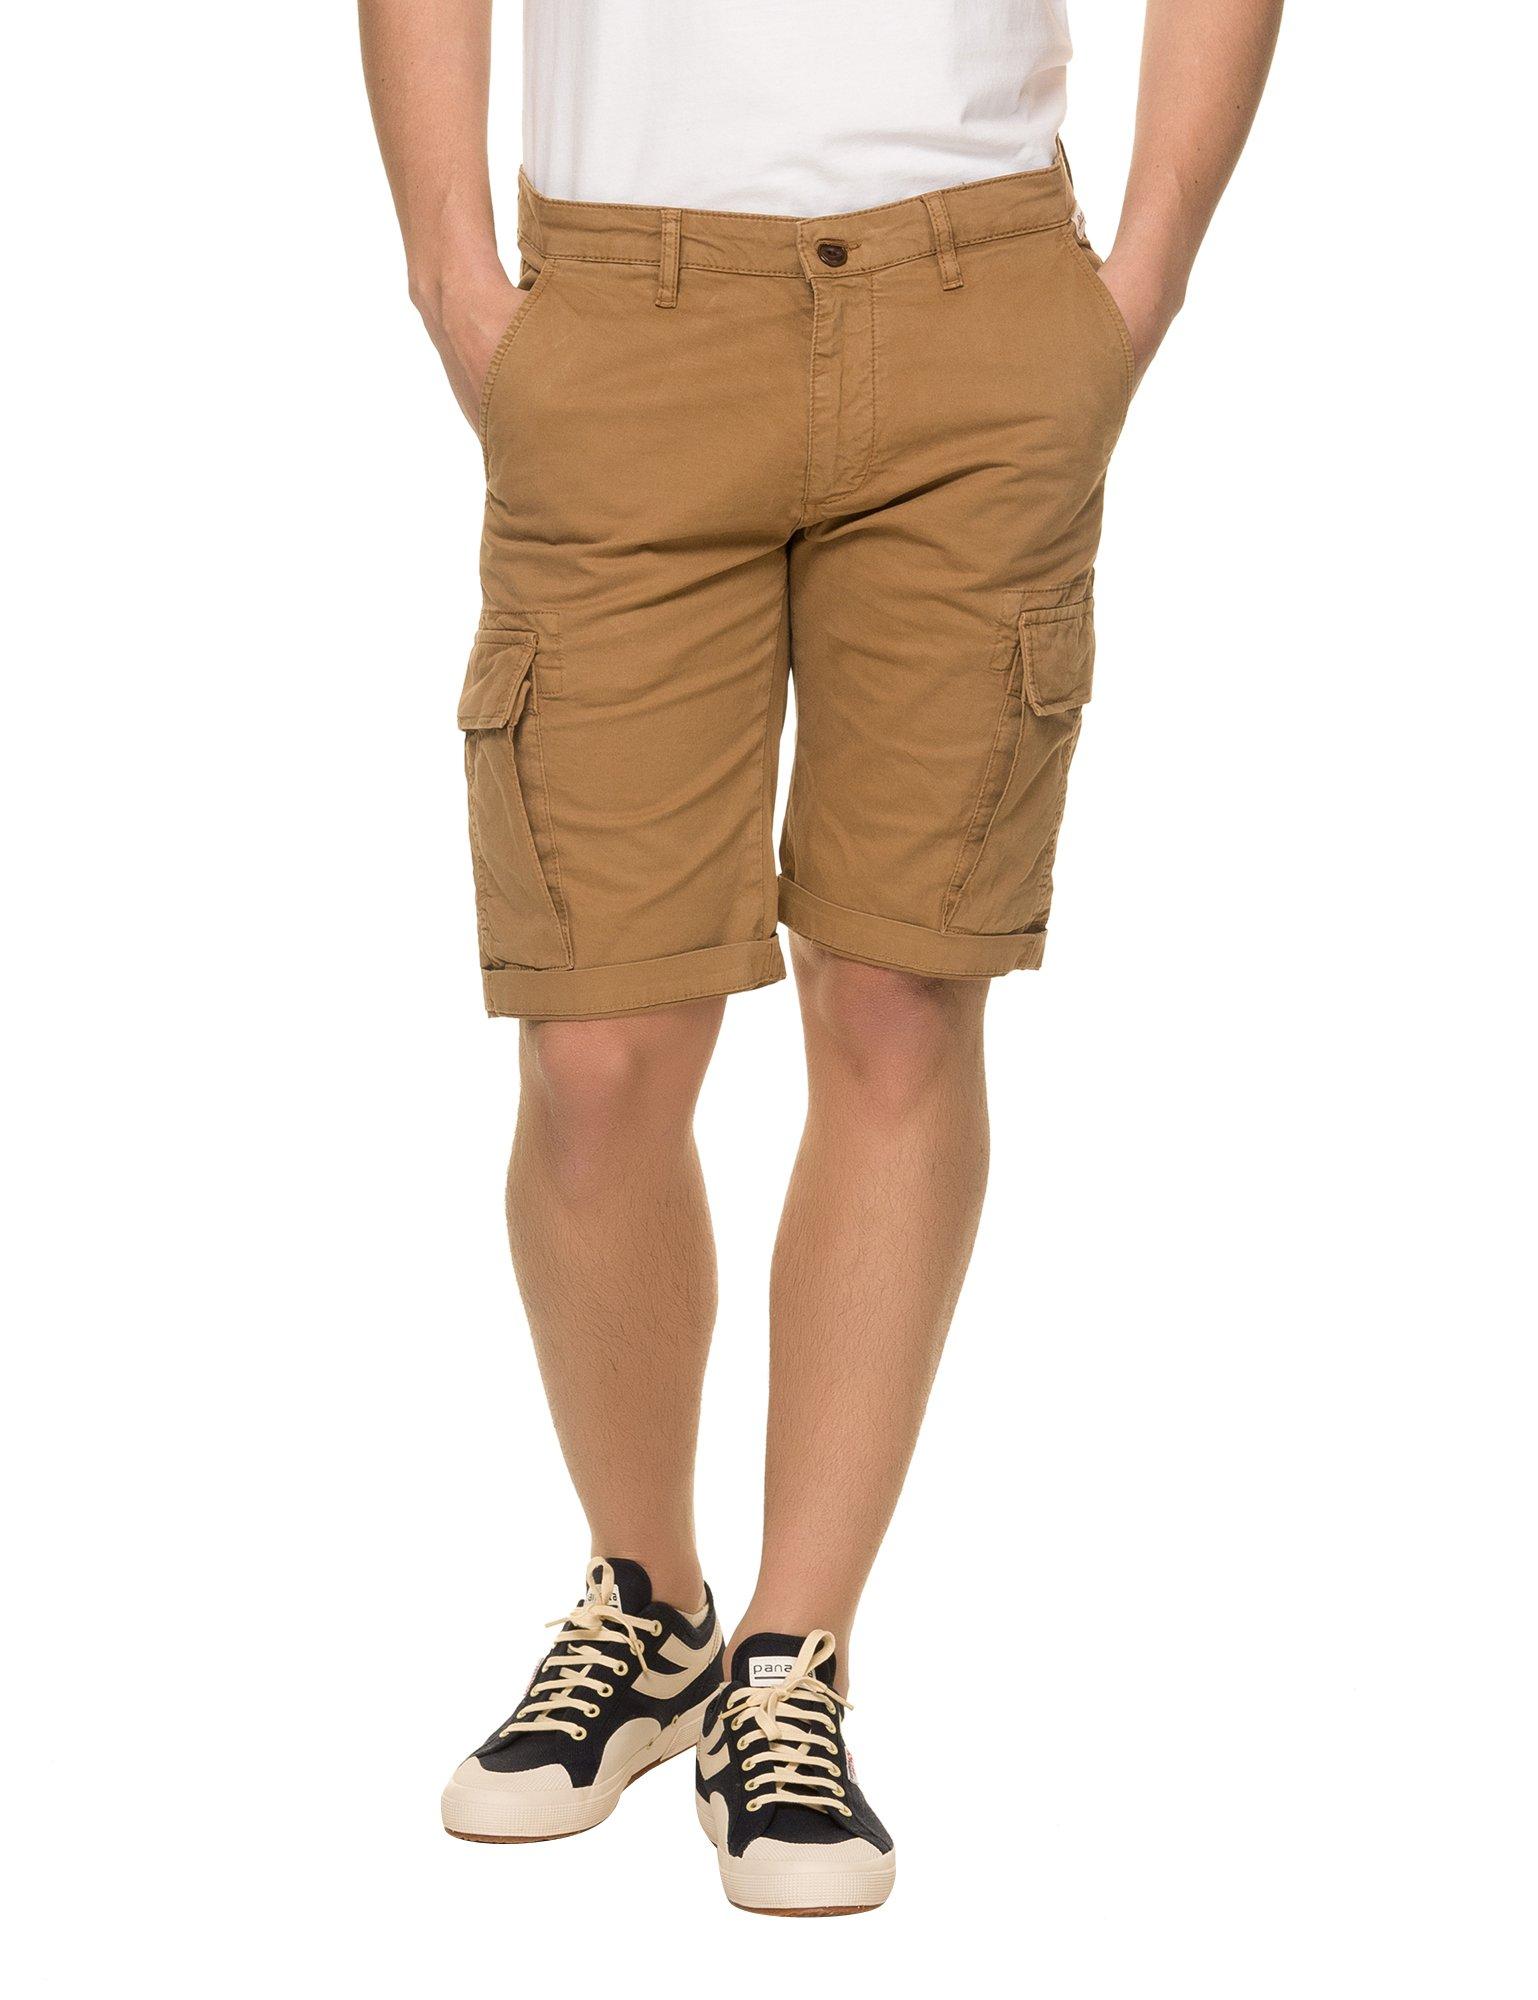 Franklin & Marshall Men's Men's Beige Gabardine Shorts in Size 30 Beige